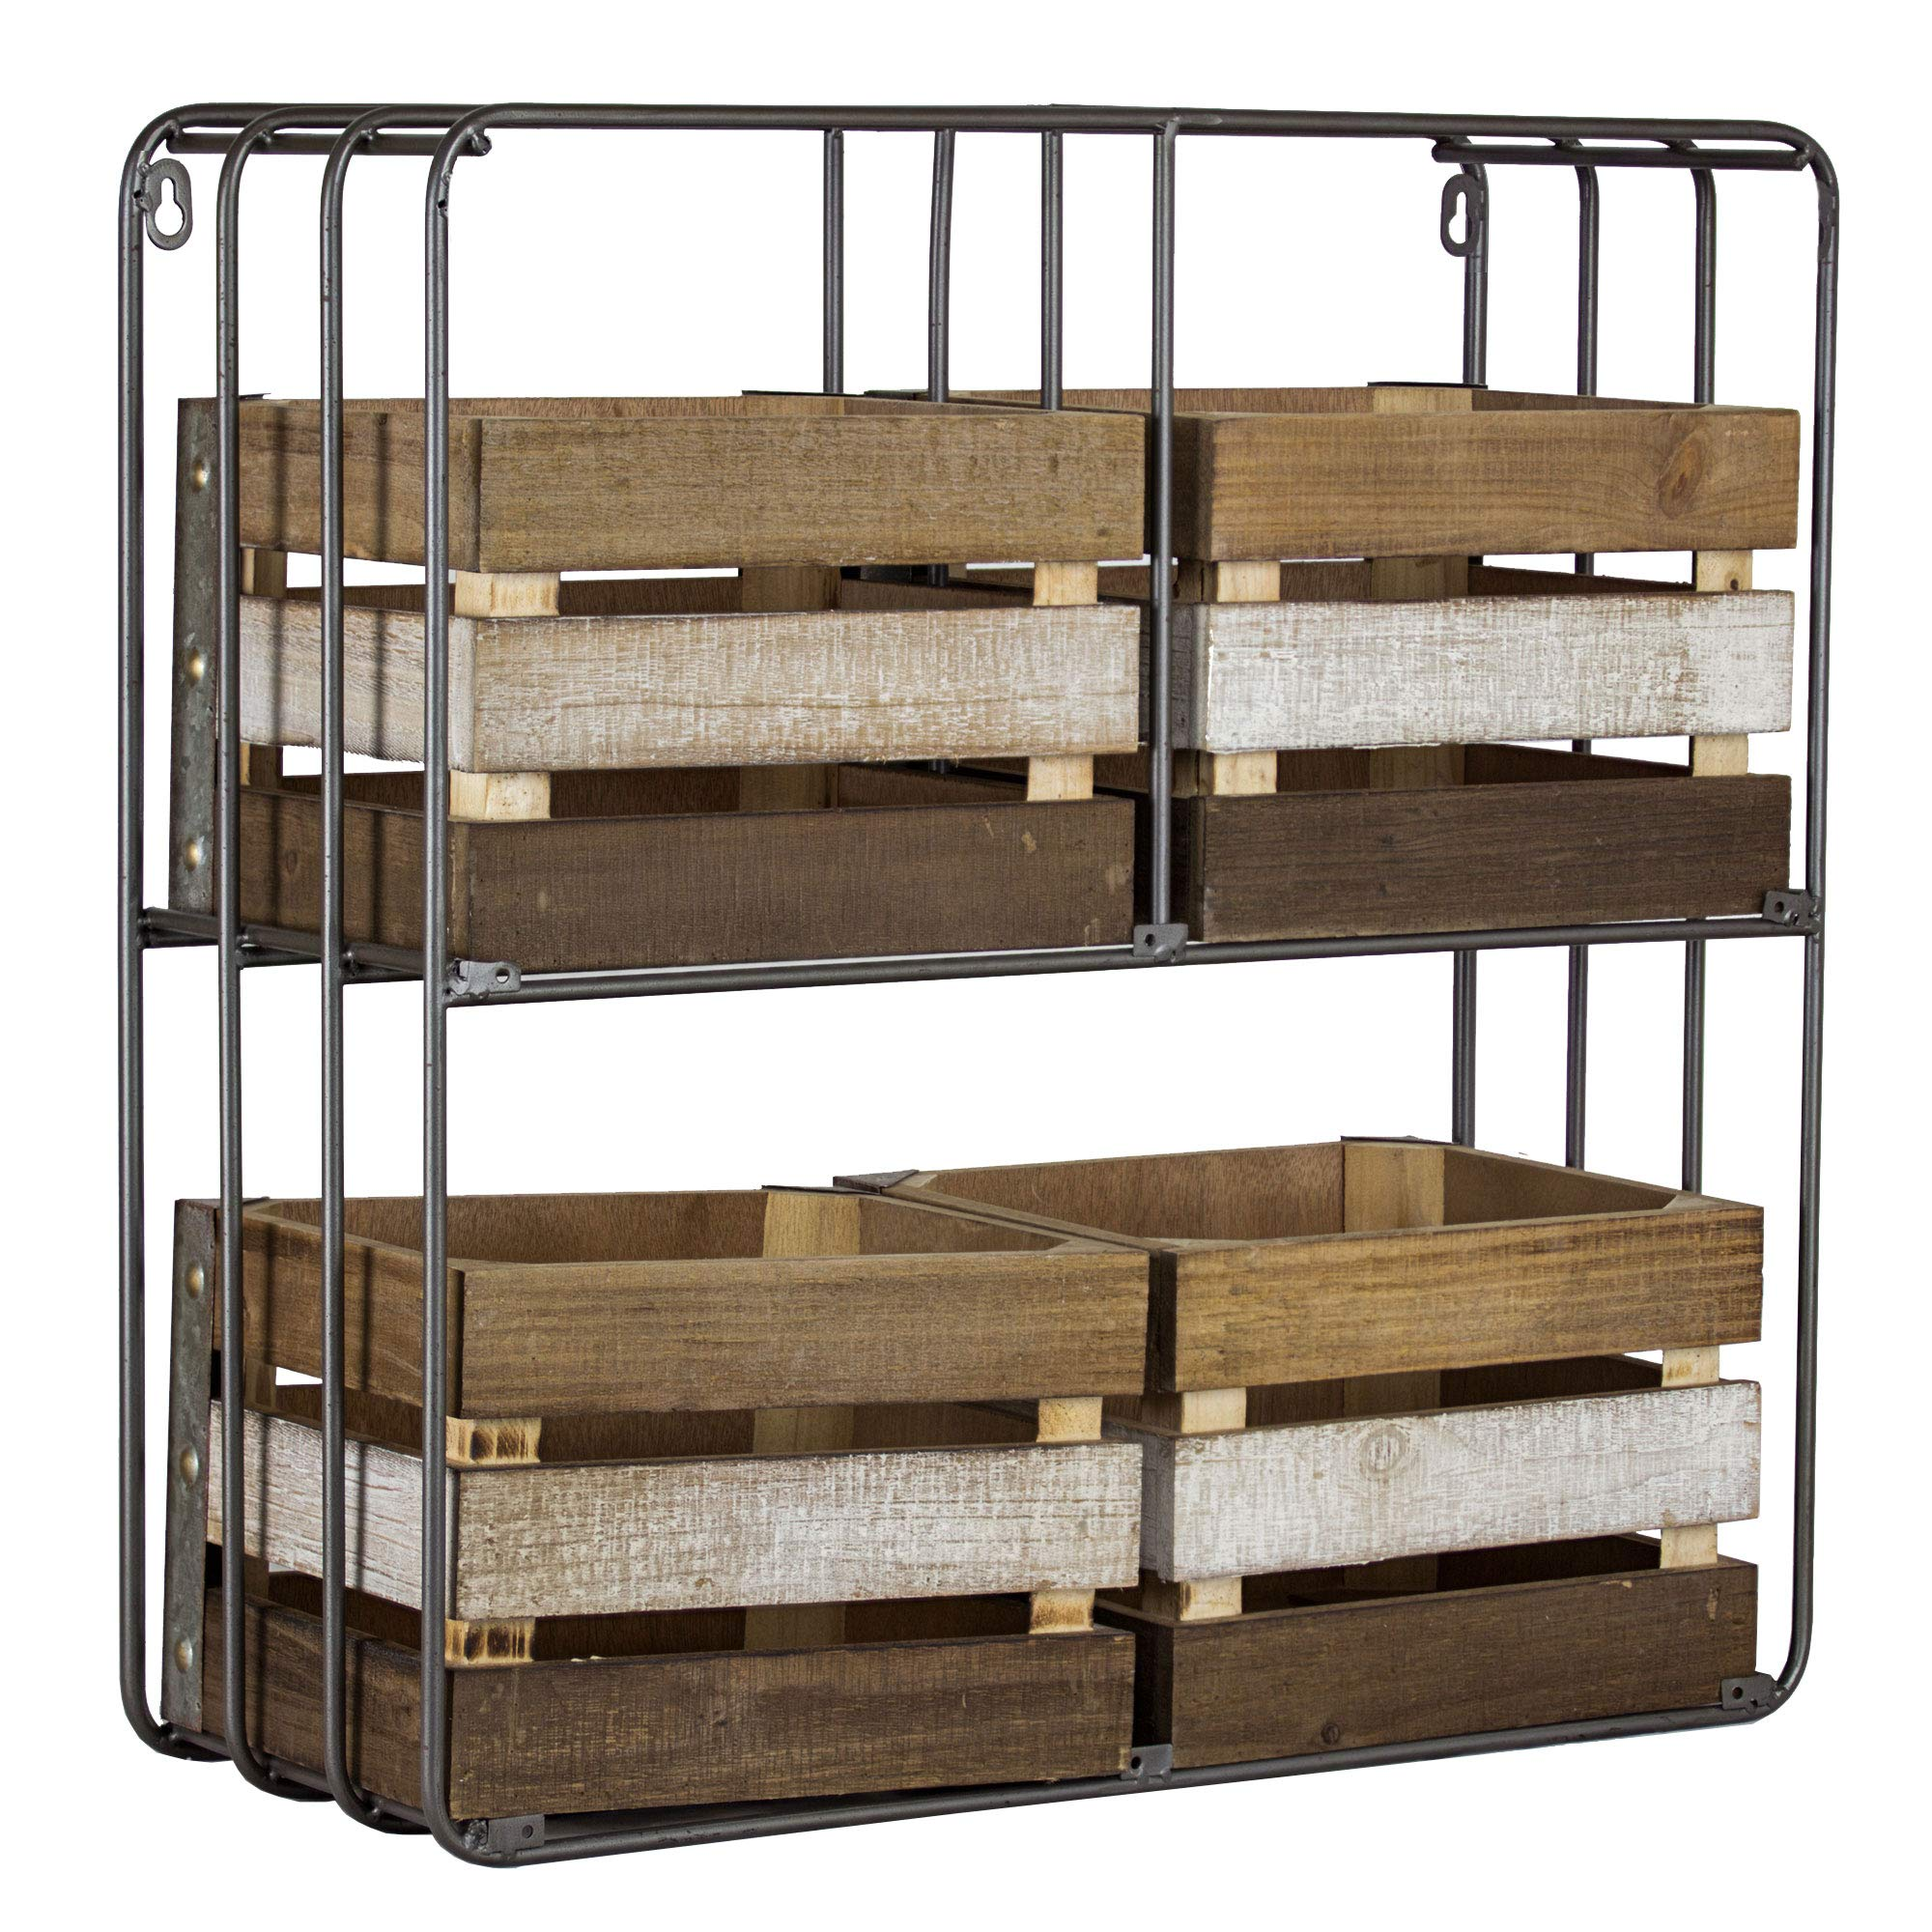 American Art Decor Shelf Organizer with Storage Crates - Vintage Country Farmhouse Decor